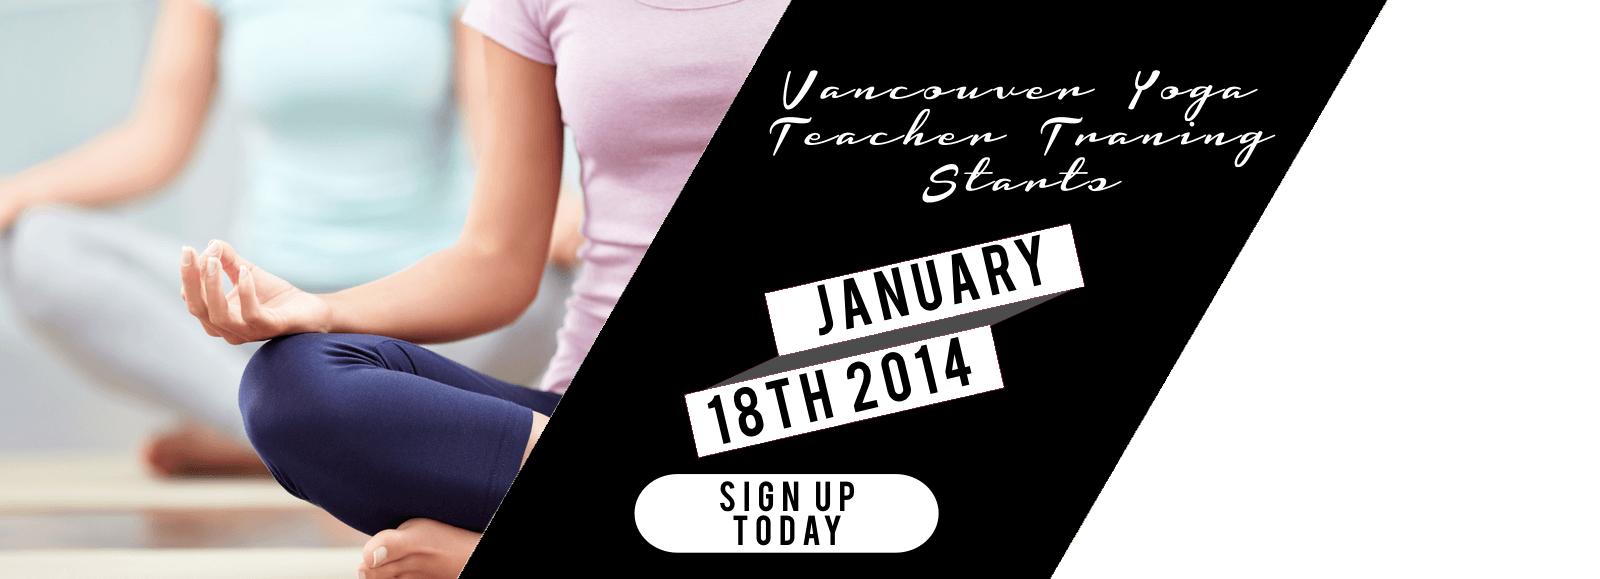 Vancouver-Yoga-Teacher-Training-2